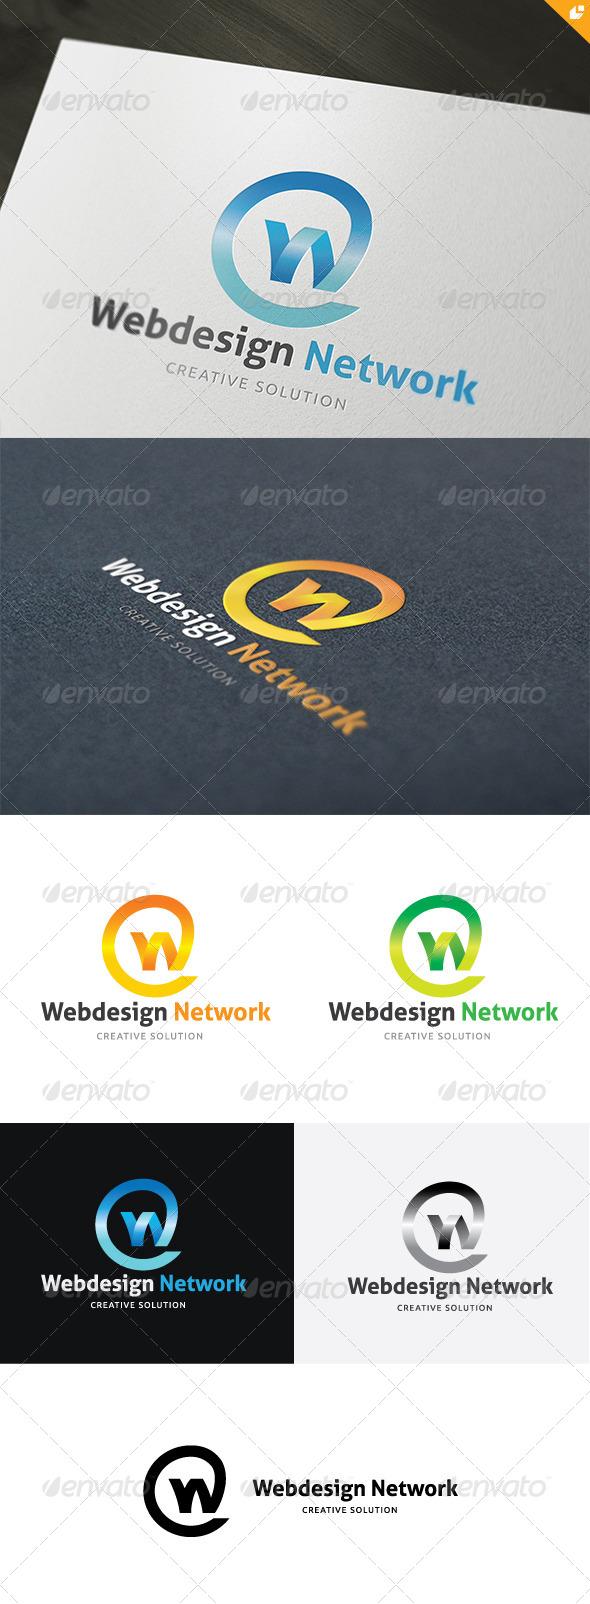 Web Design Network Logo